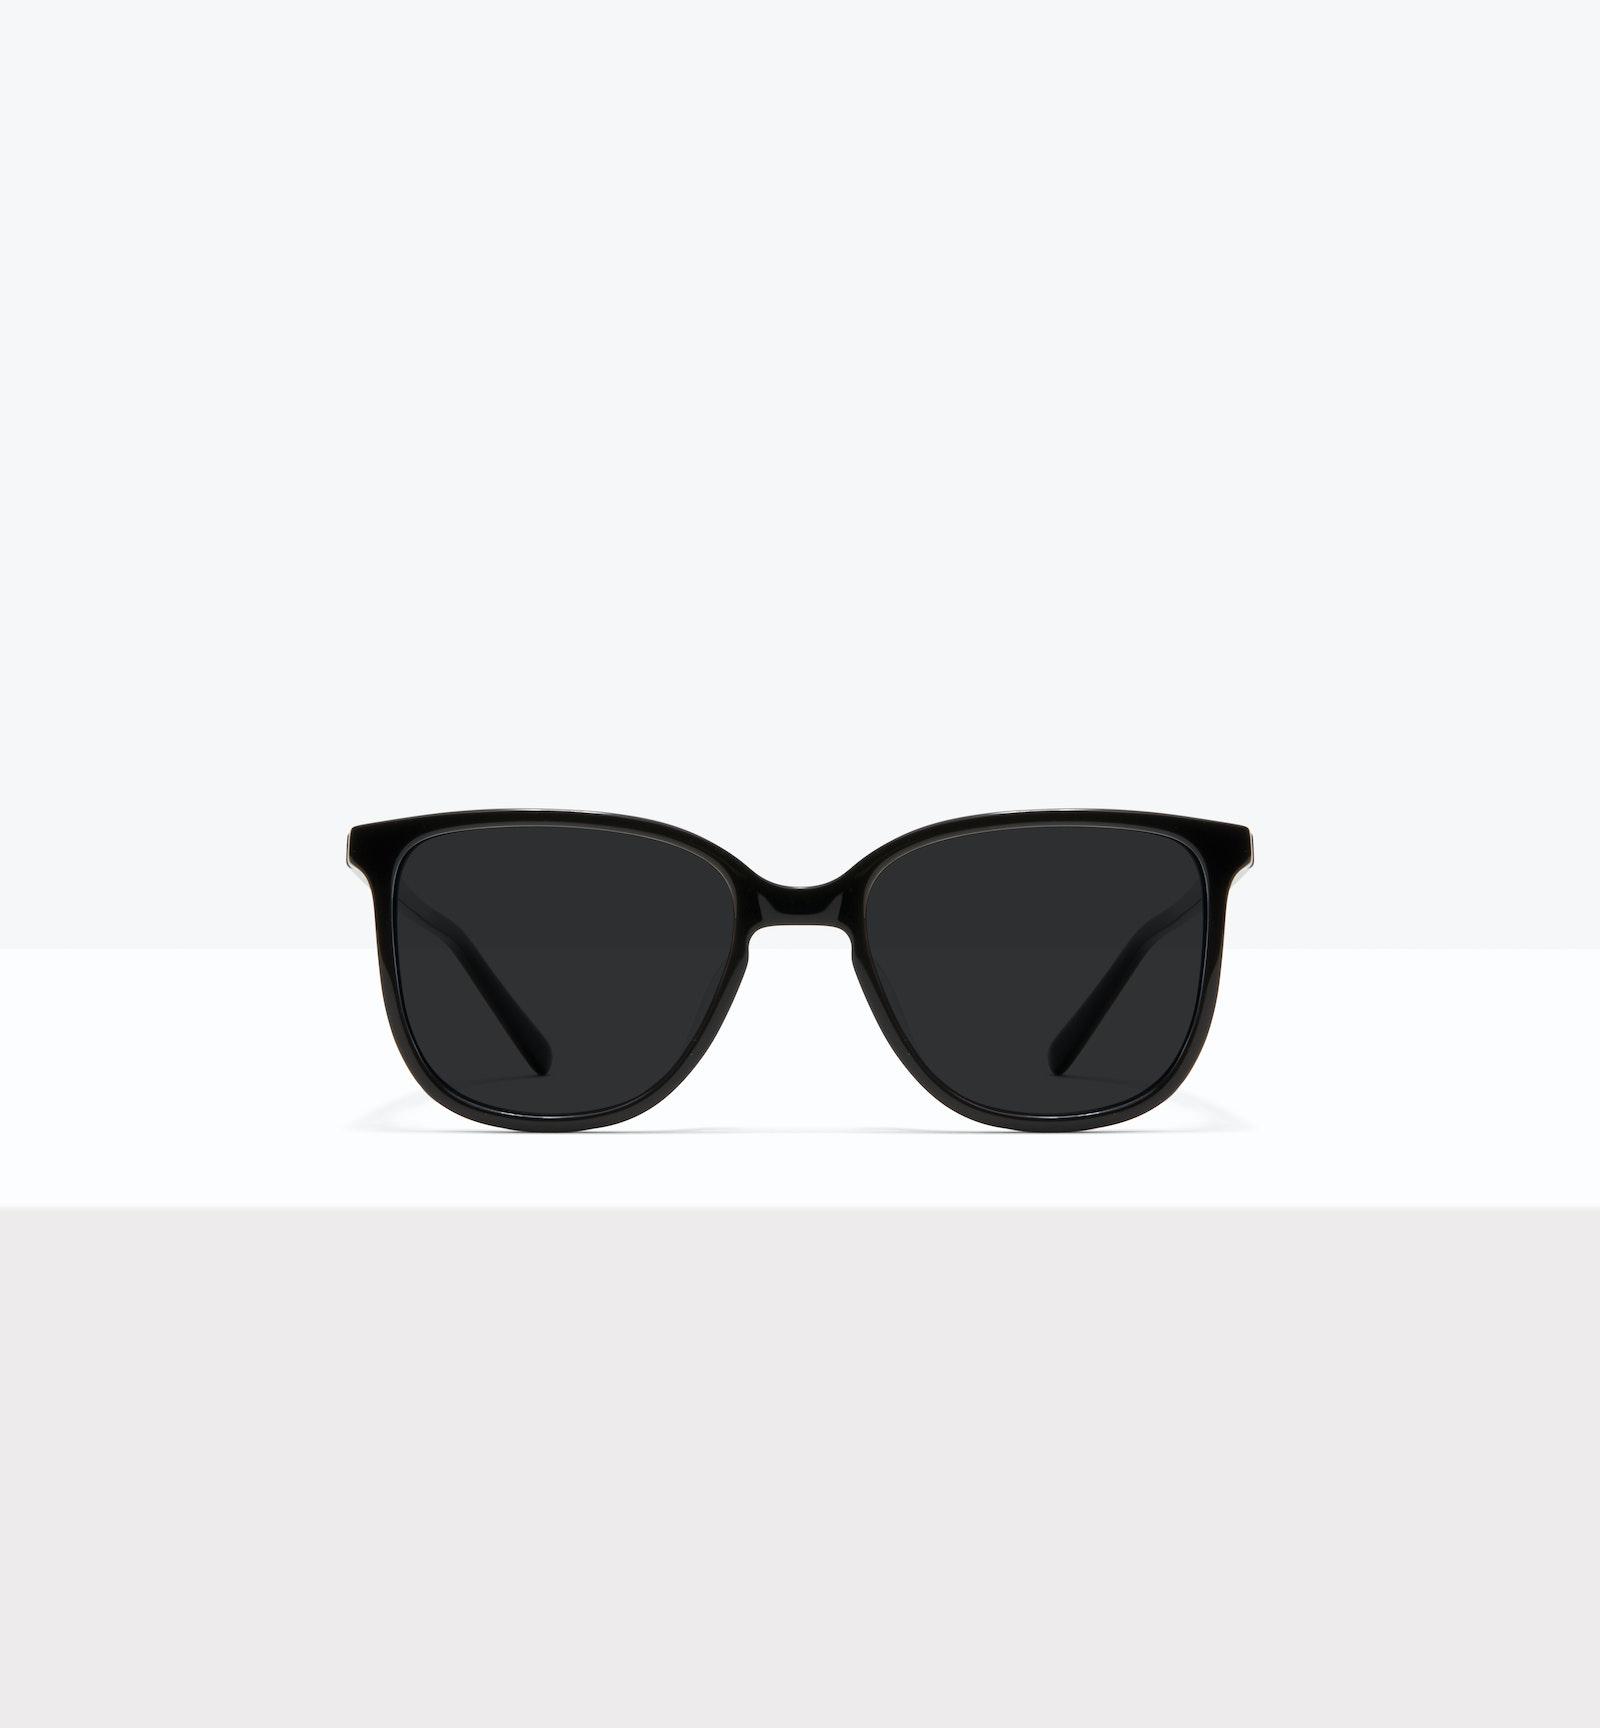 Affordable Fashion Glasses Square Sunglasses Women Lead XL Black